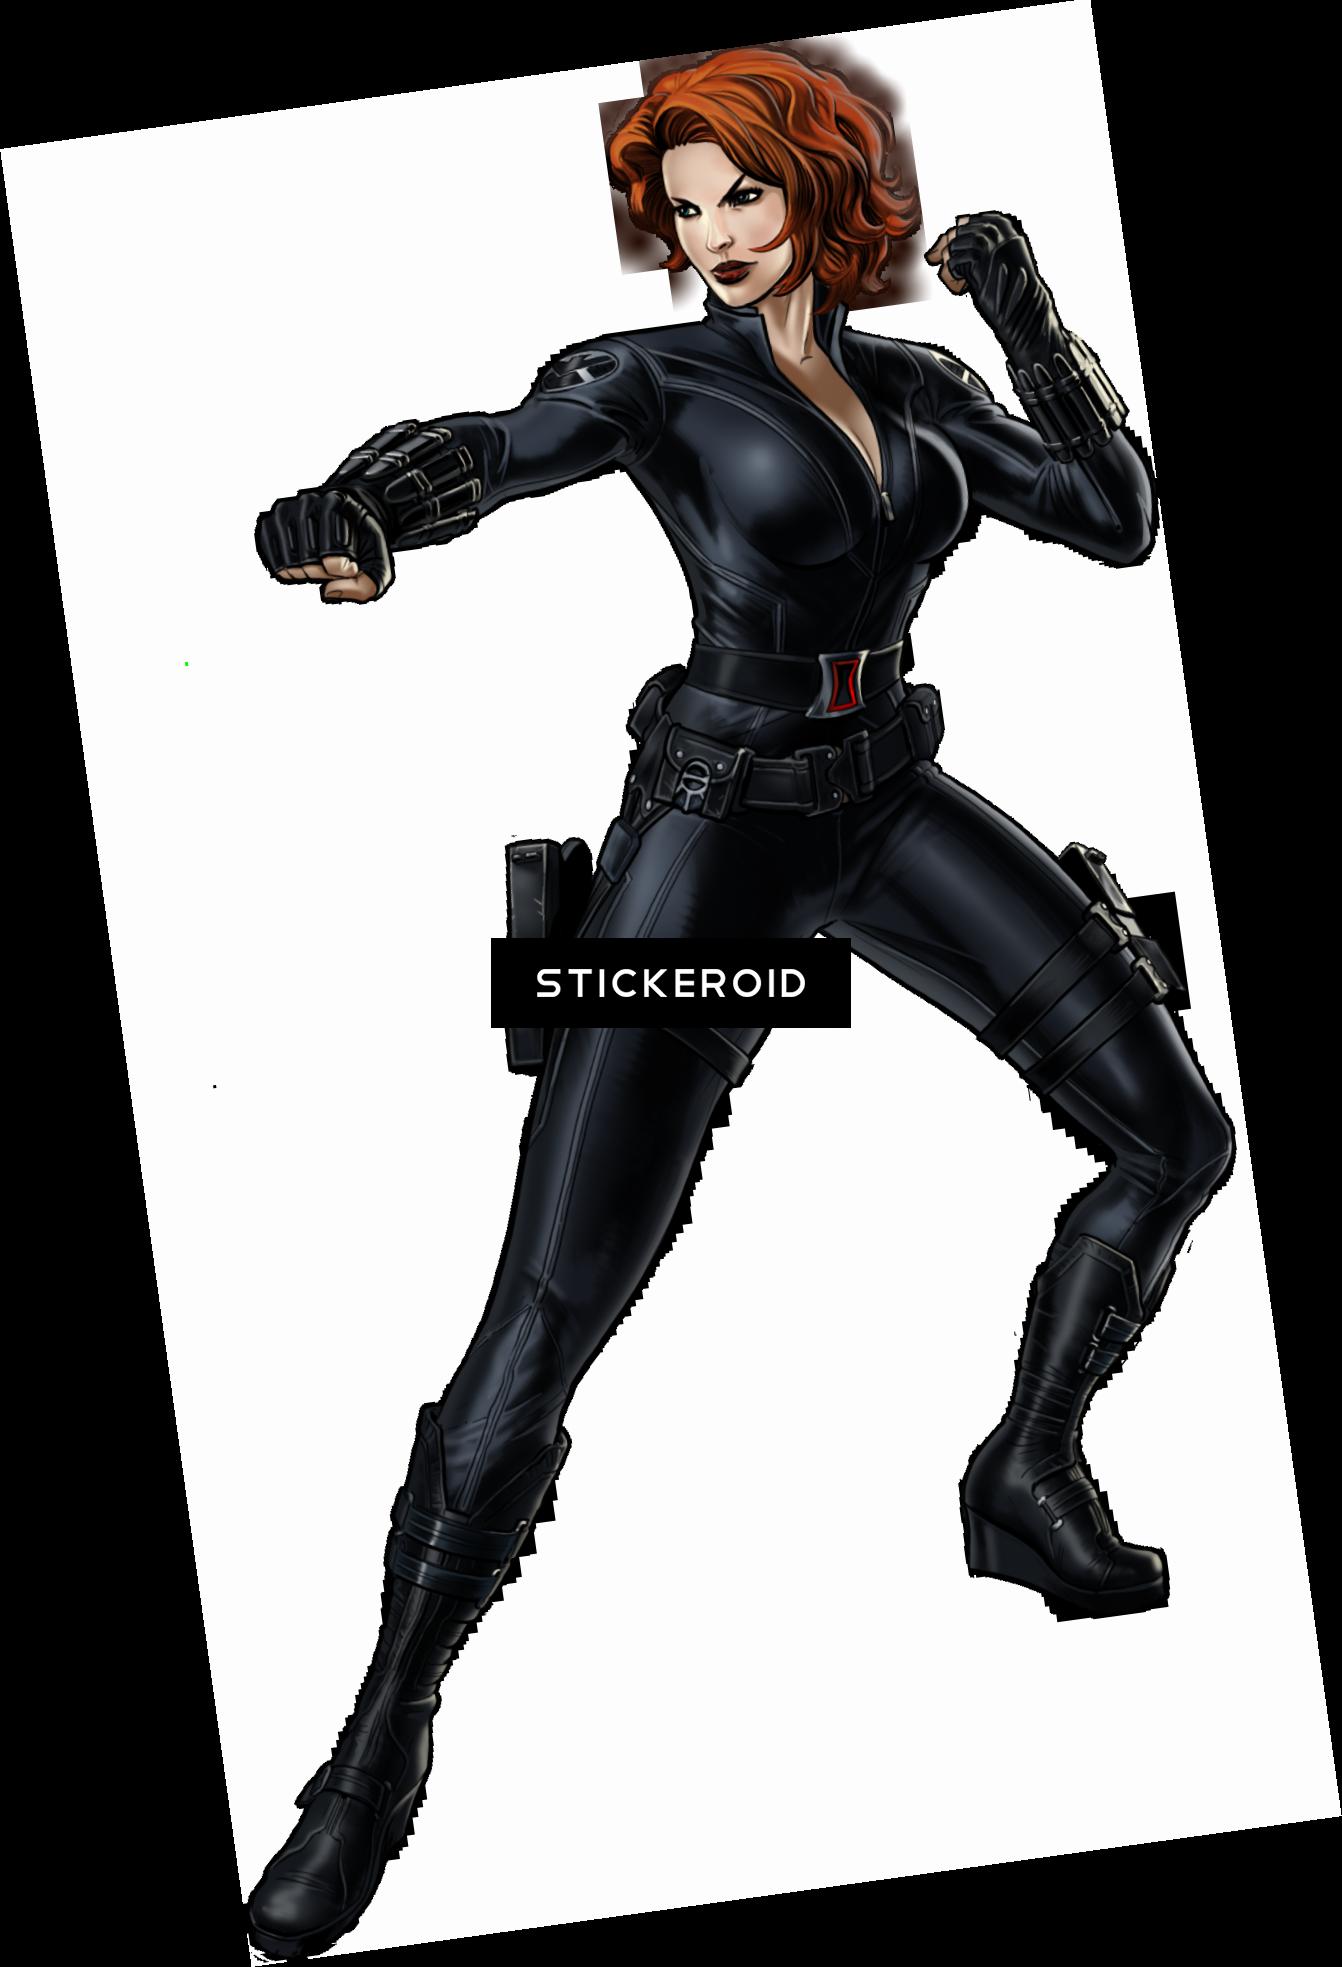 Download Black Widow Avengers Dessin Black Widow Full Size Png Image Pngkit